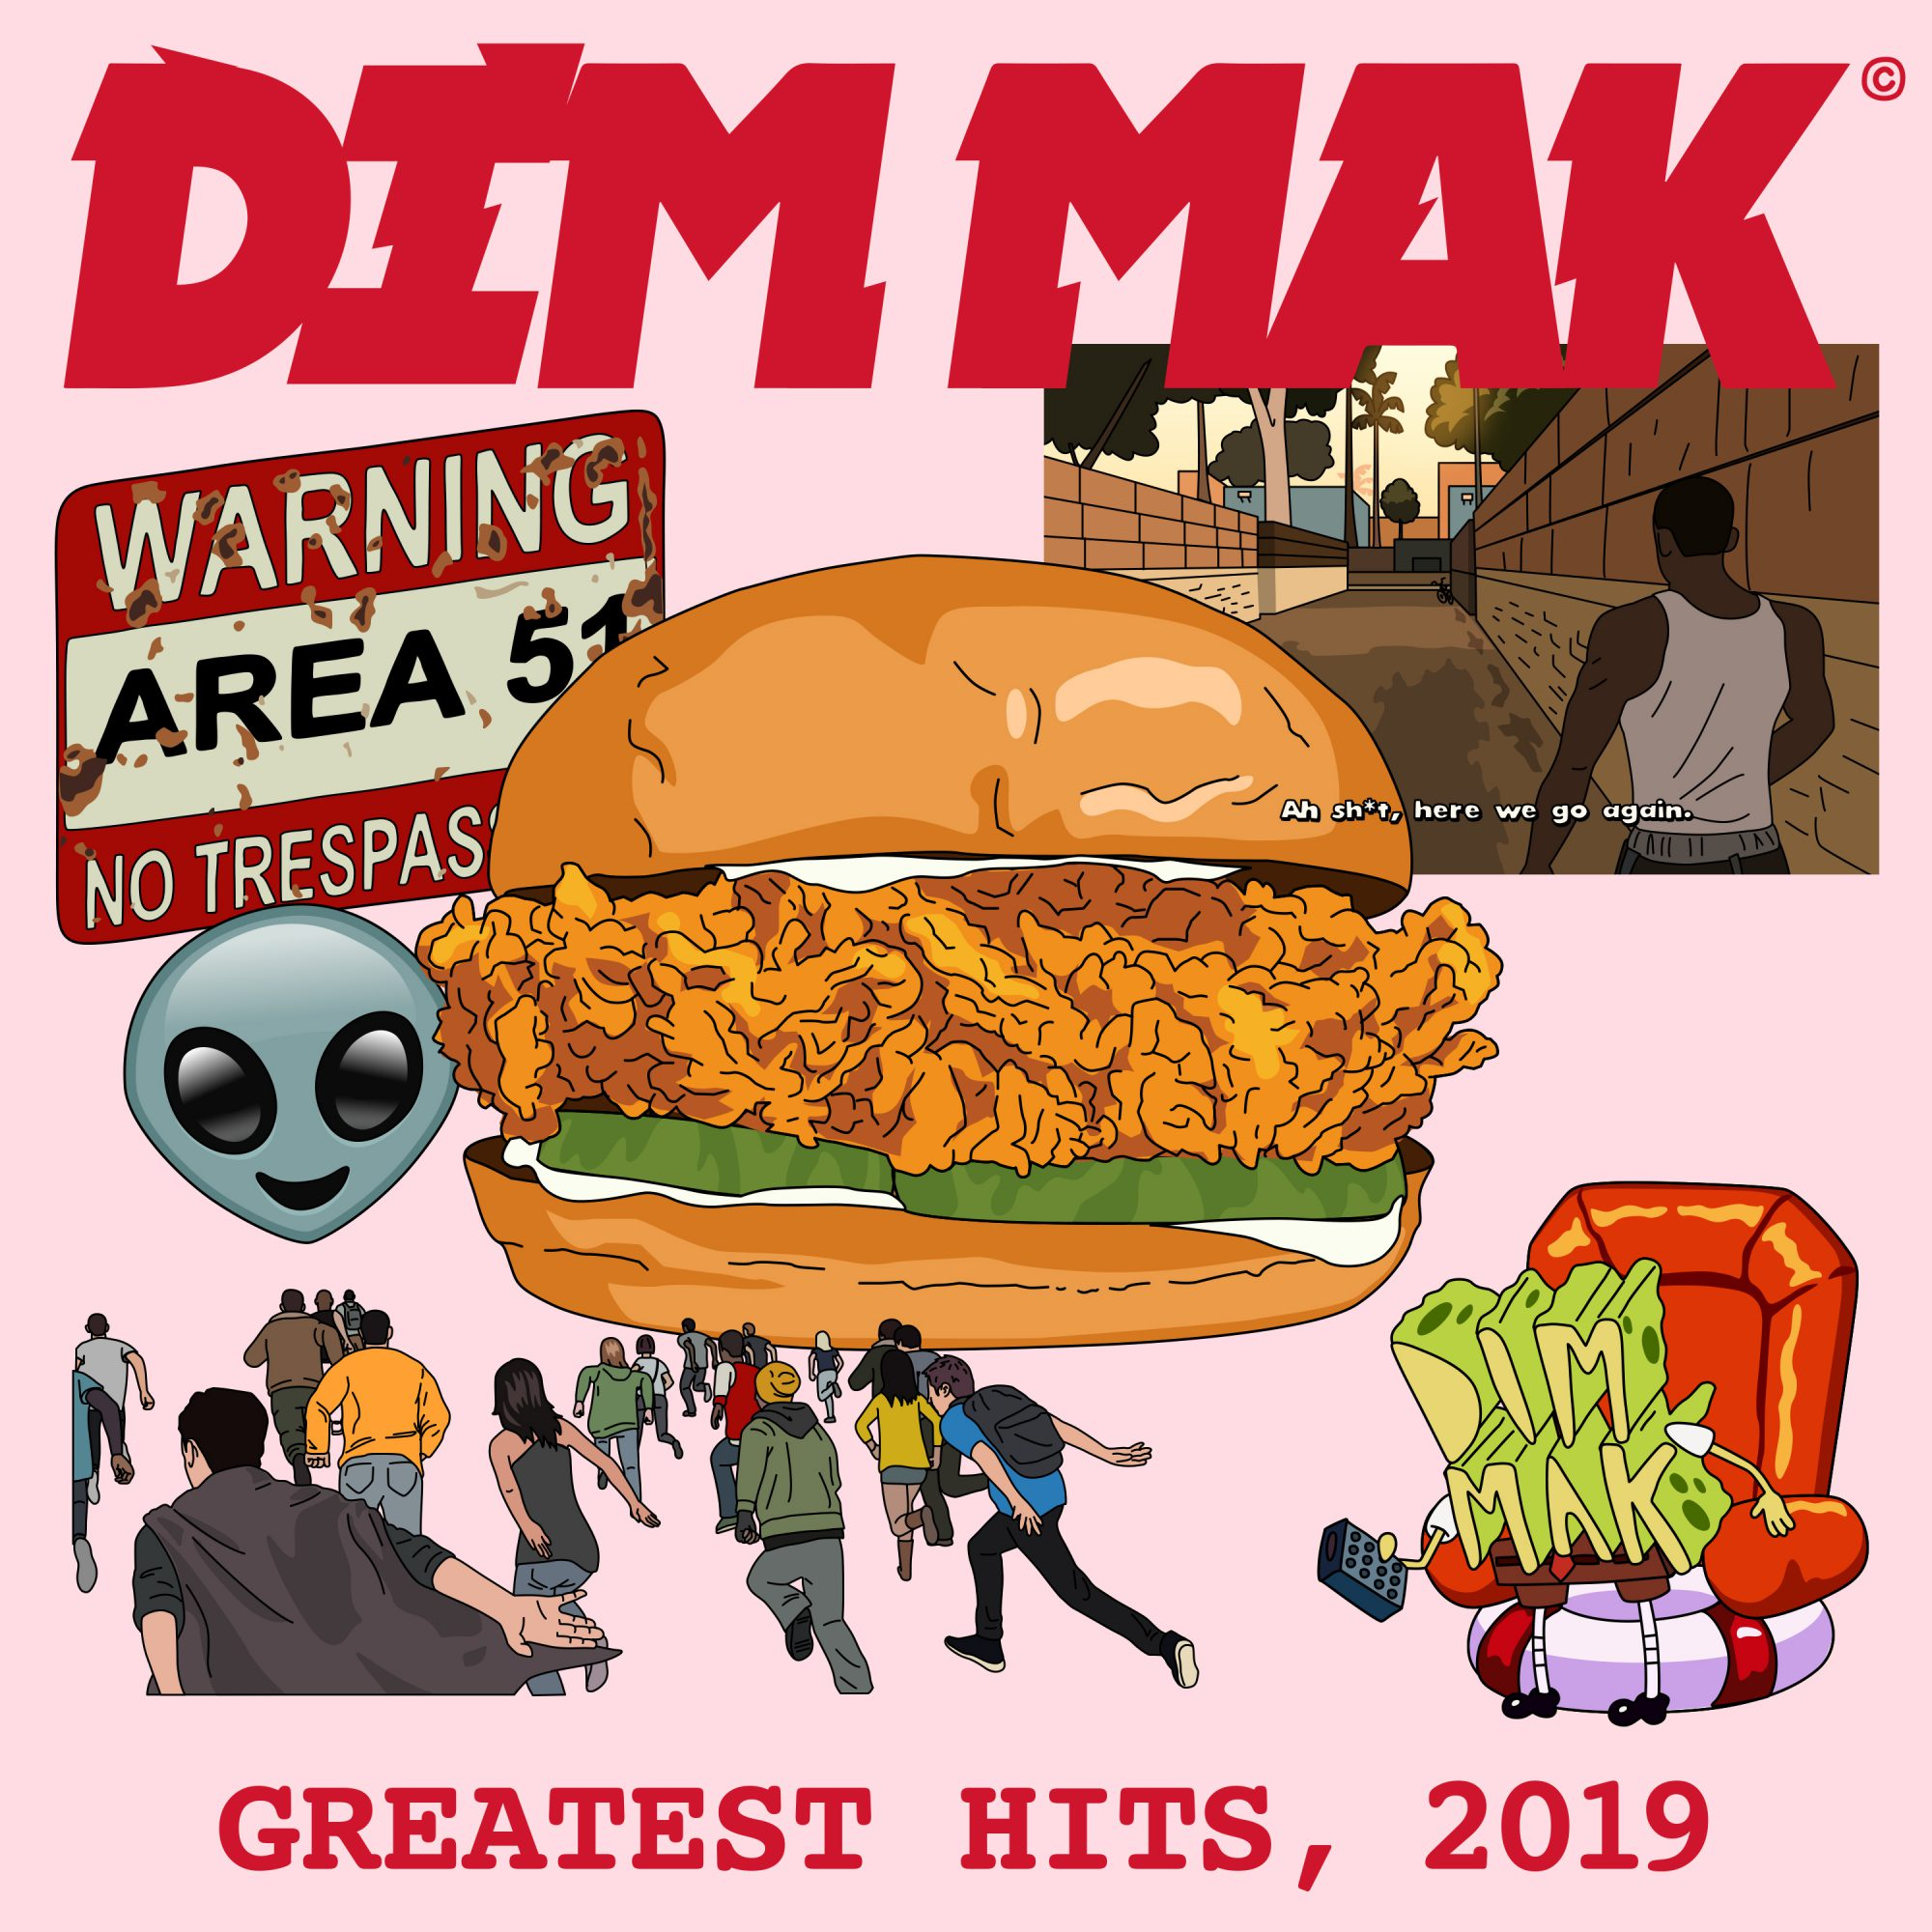 Dim Mak Greatest Hits 2019: Originals